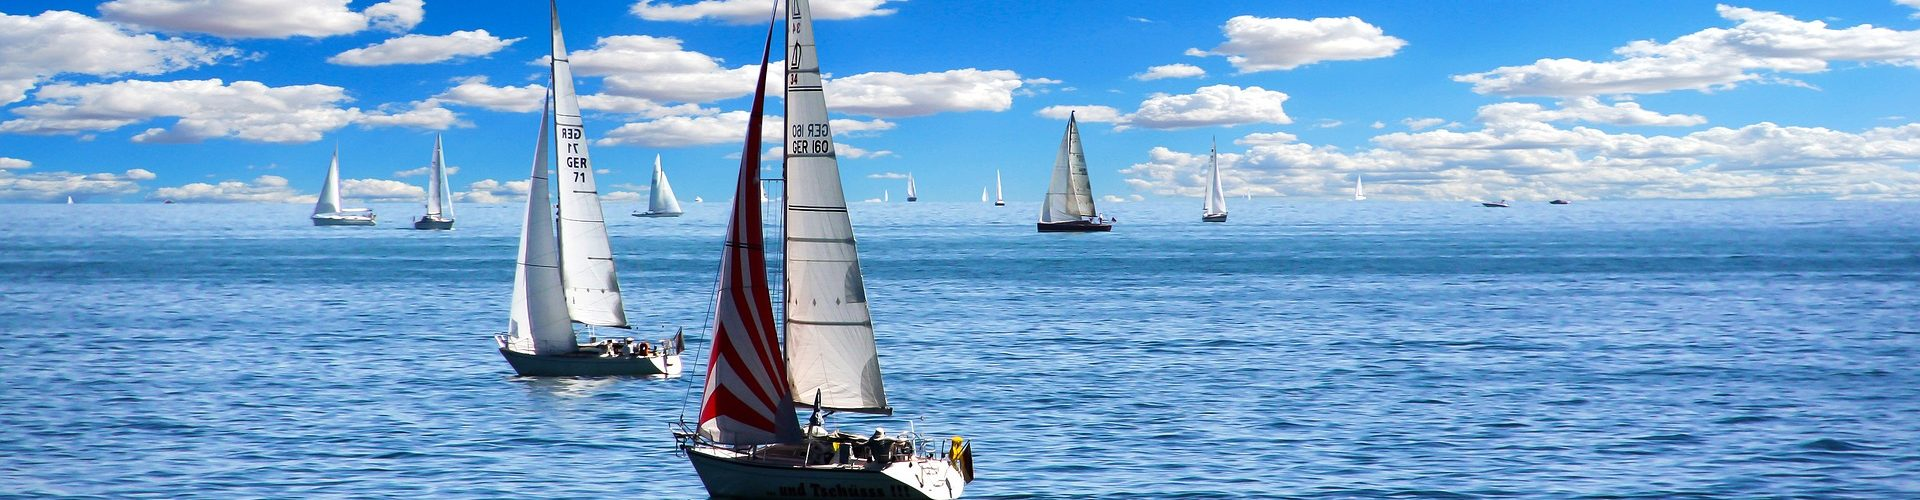 segeln lernen in Immenstaad am Bodensee segelschein machen in Immenstaad am Bodensee 1920x500 - Segeln lernen in Immenstaad am Bodensee